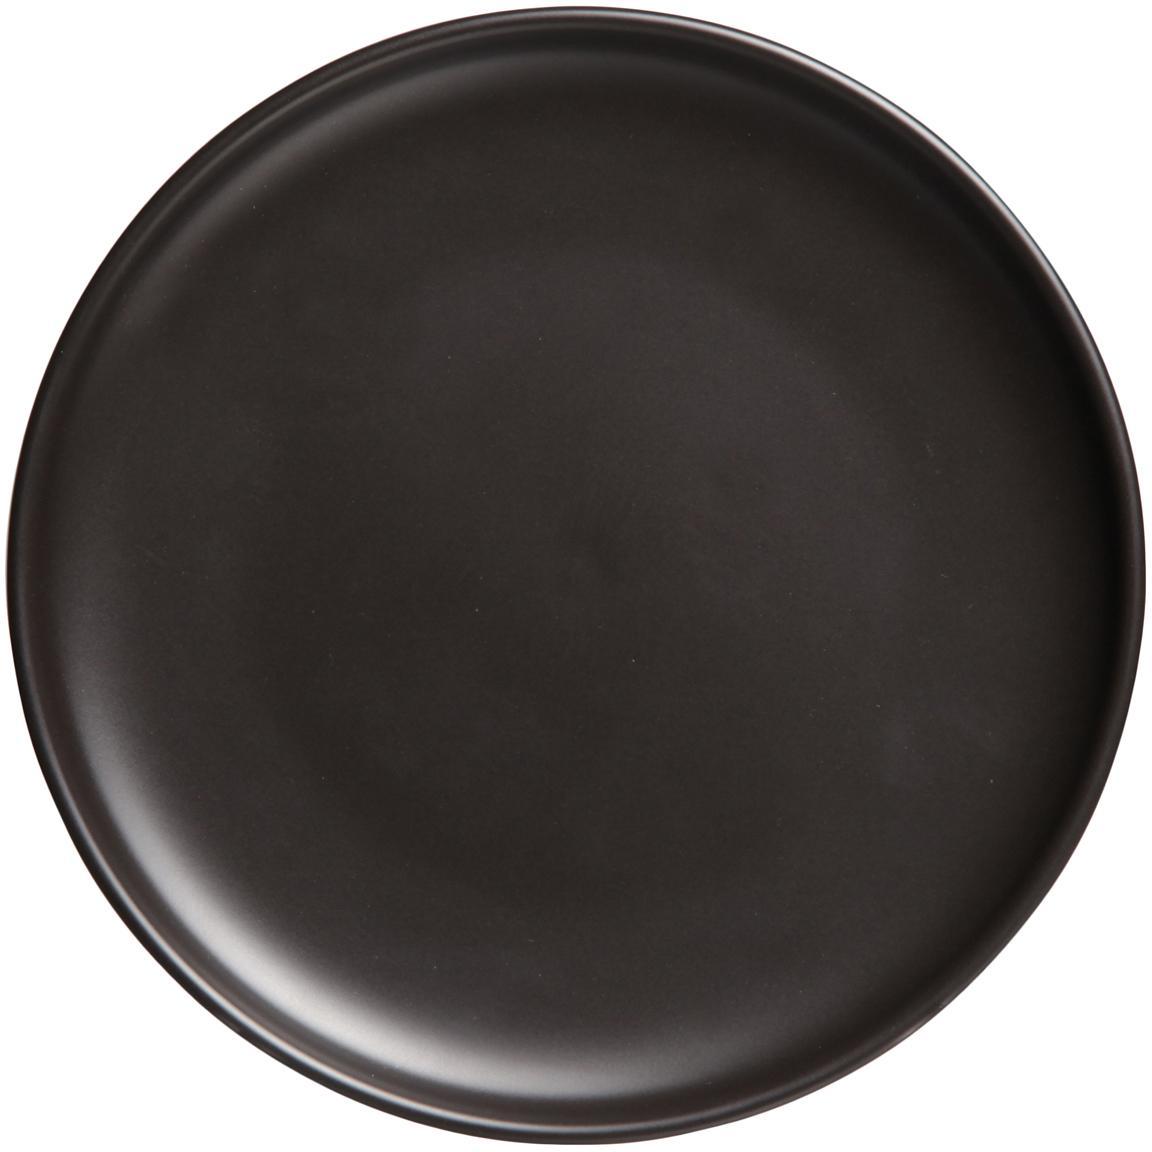 Piattino da dessert nero opaco Okinawa 6 pz, Ceramica, Nero opaco, Ø 20 cm